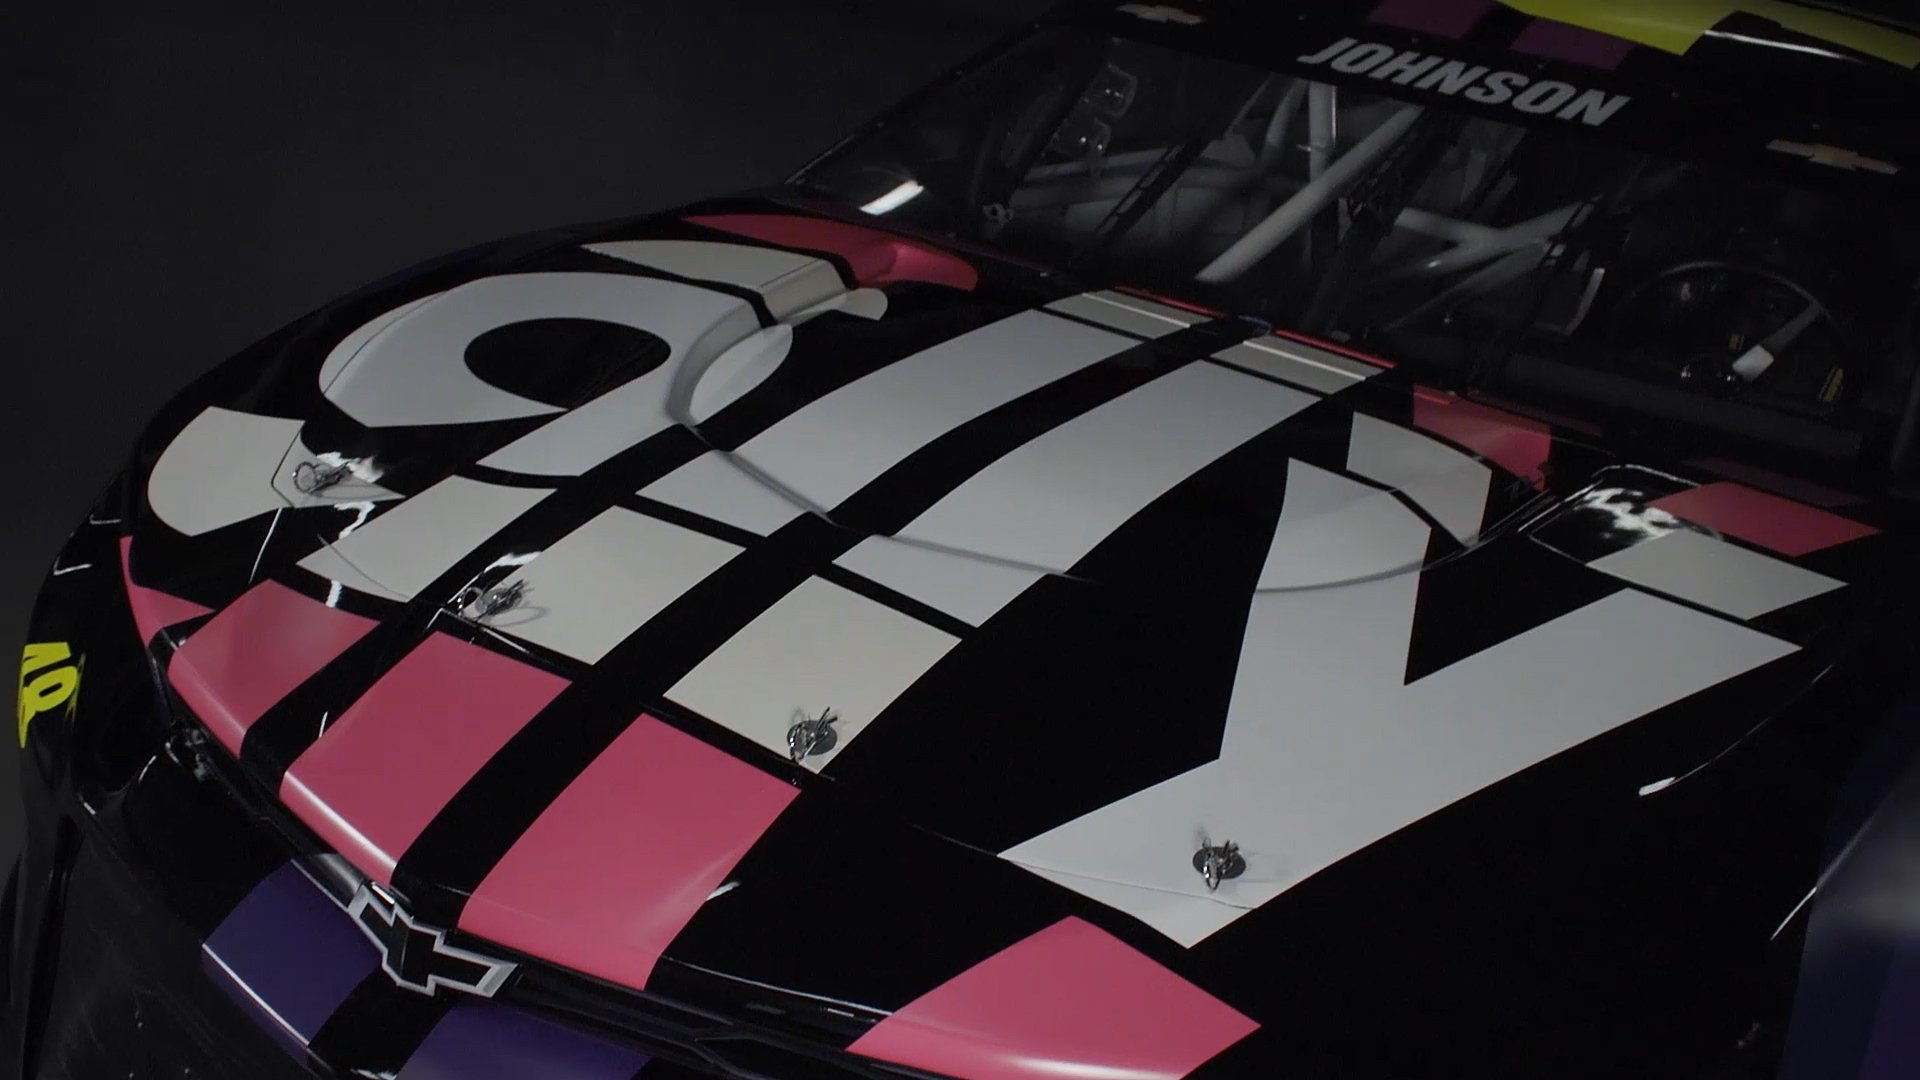 Bob Johnson Chevrolet >> Jimmie Johnson - 2019 Paint Scheme: Ally Financial (Video) - Racing News